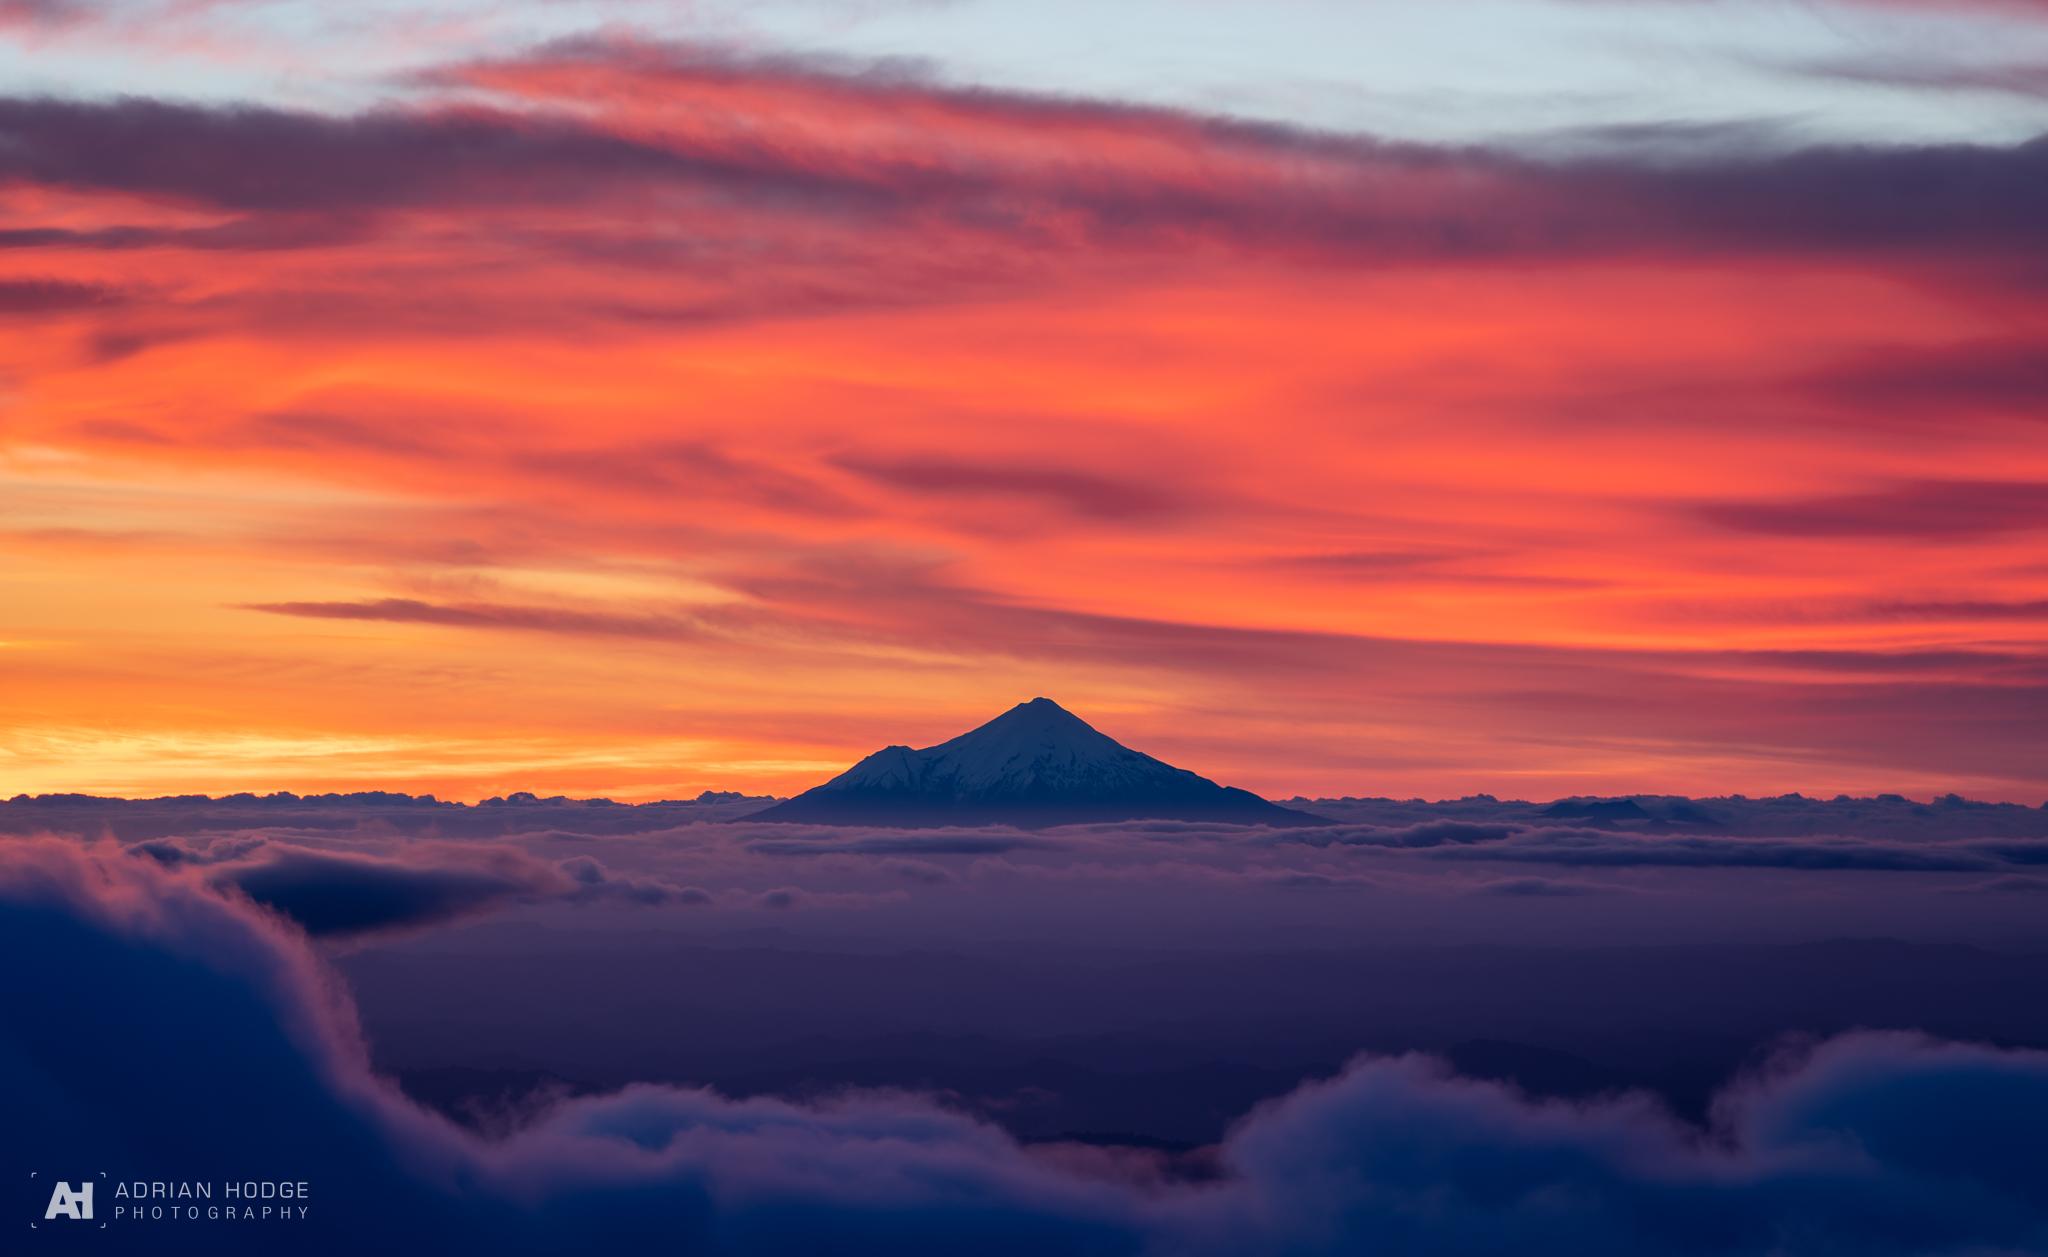 Mt Taranaki (Egmont) from Ruapehu at Sunset